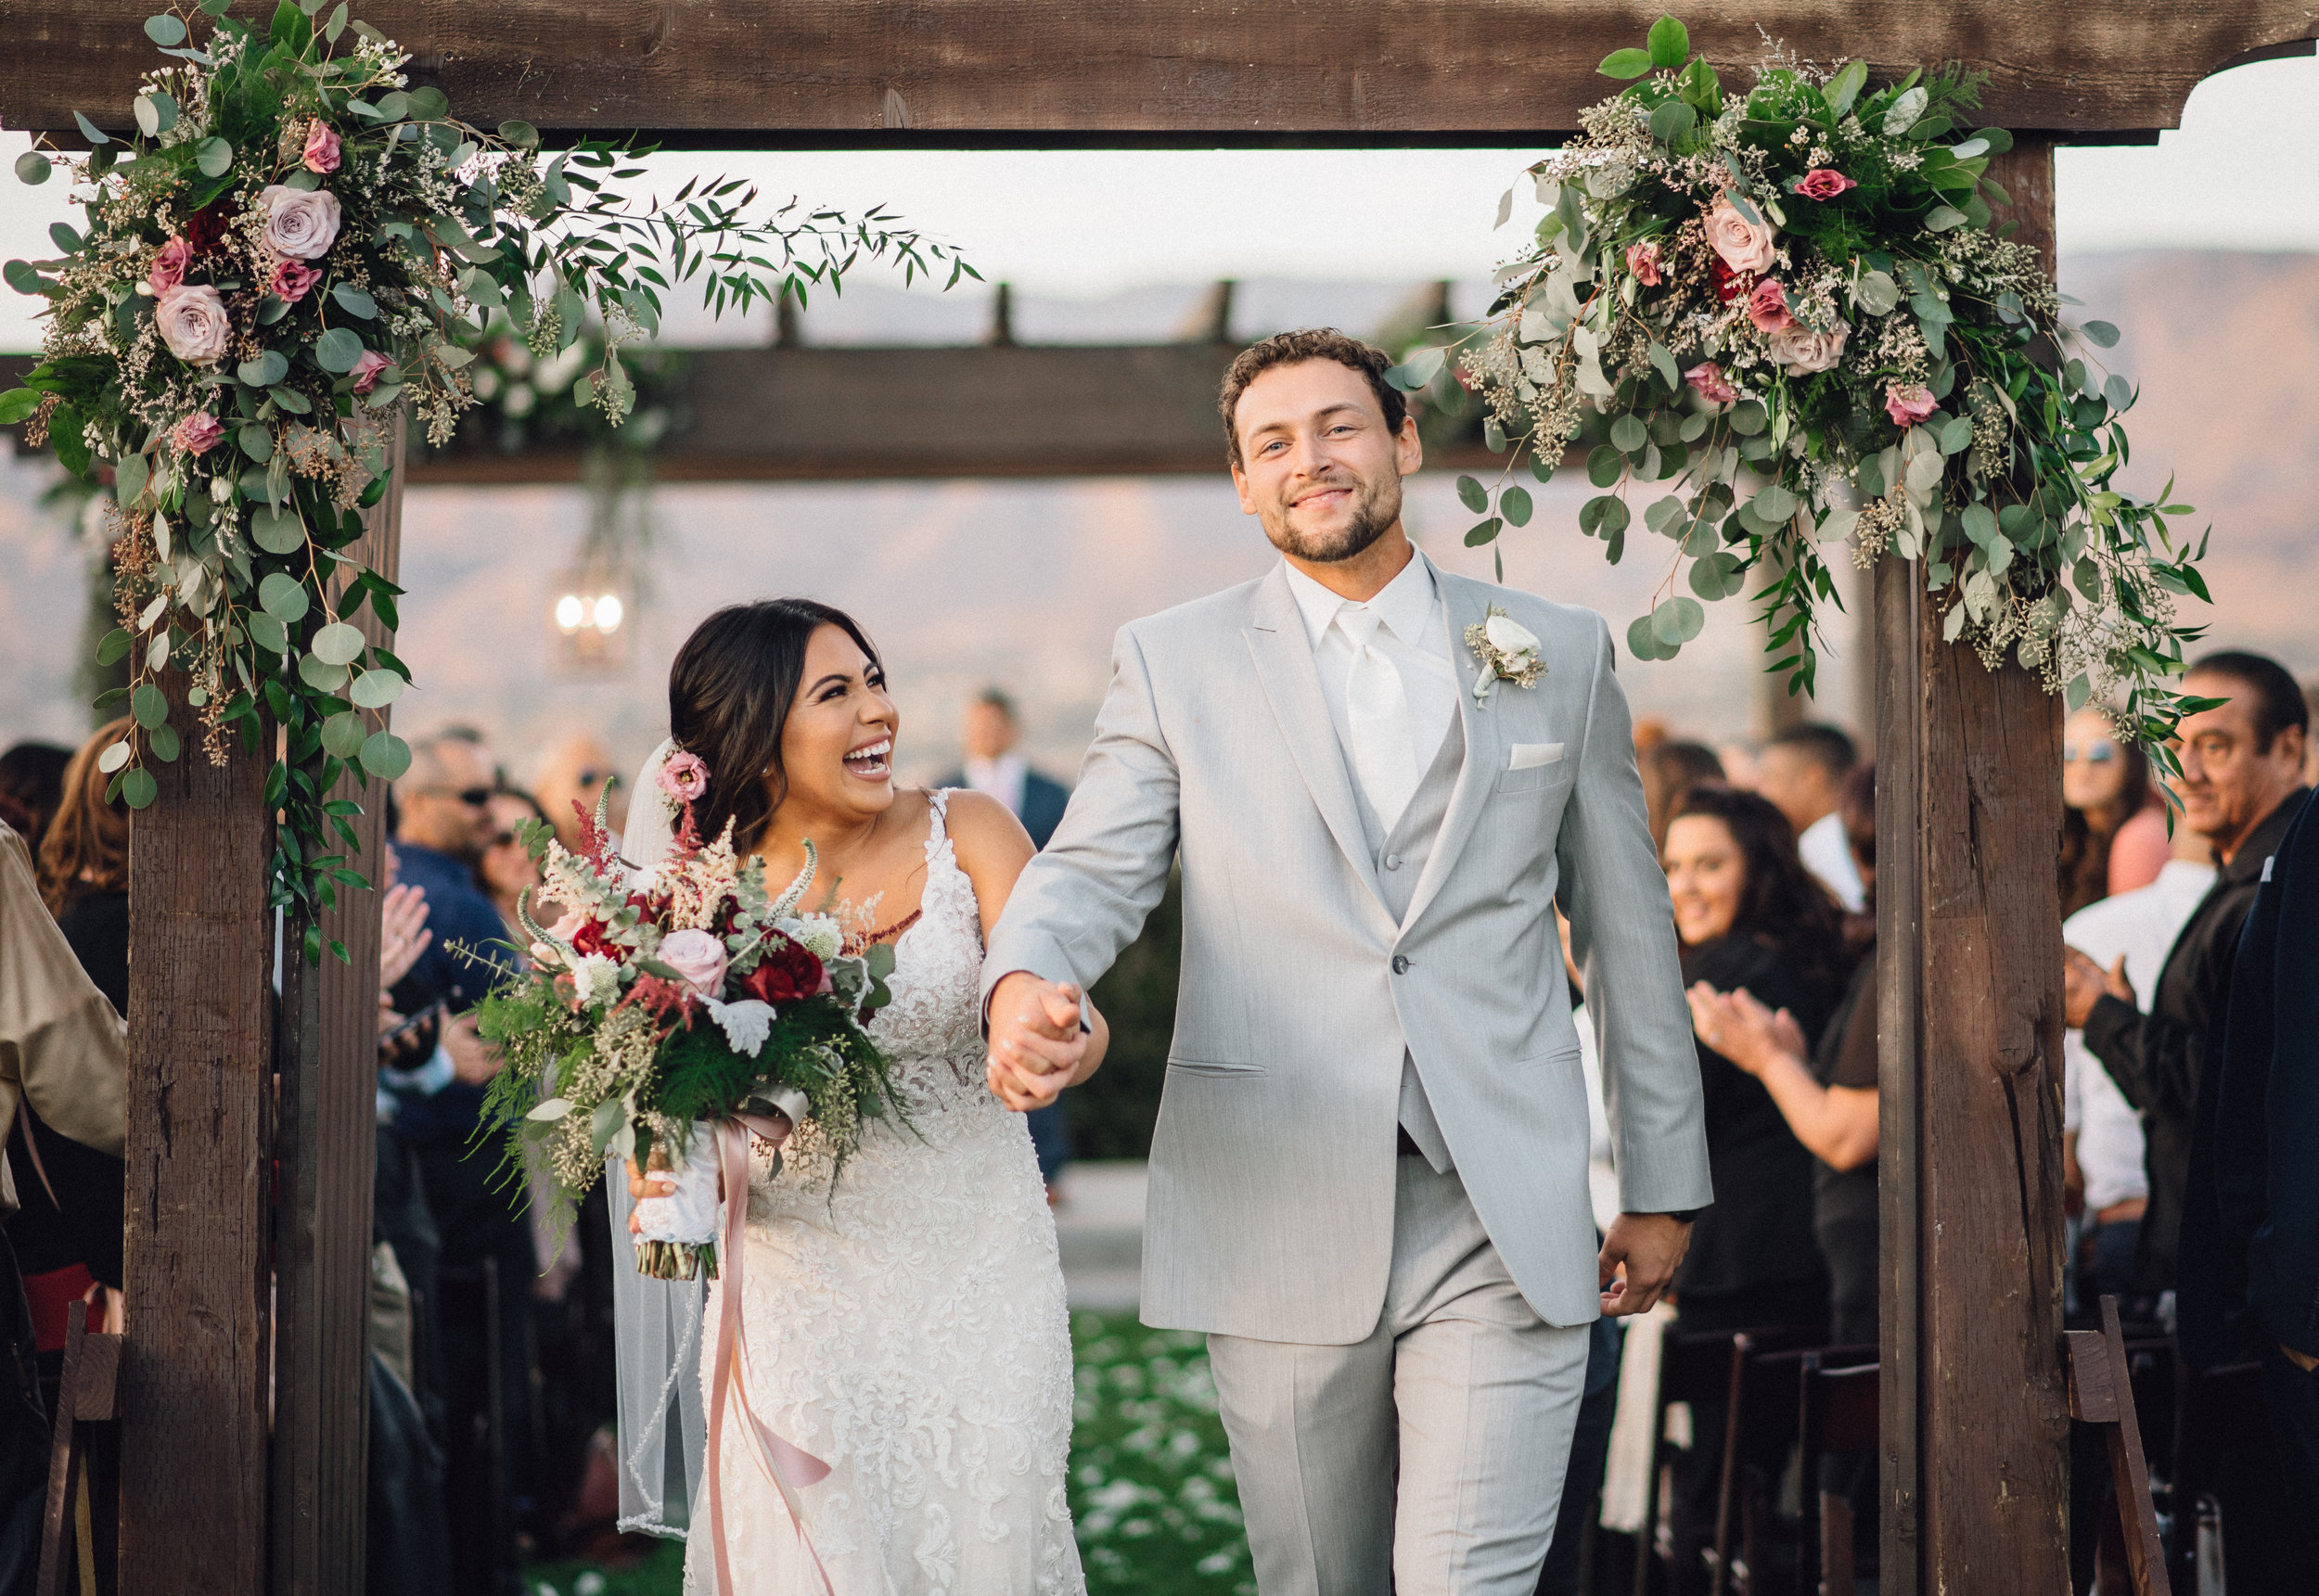 Southern-California-Wedding-Photography-Ksquared-Photography-740.jpg